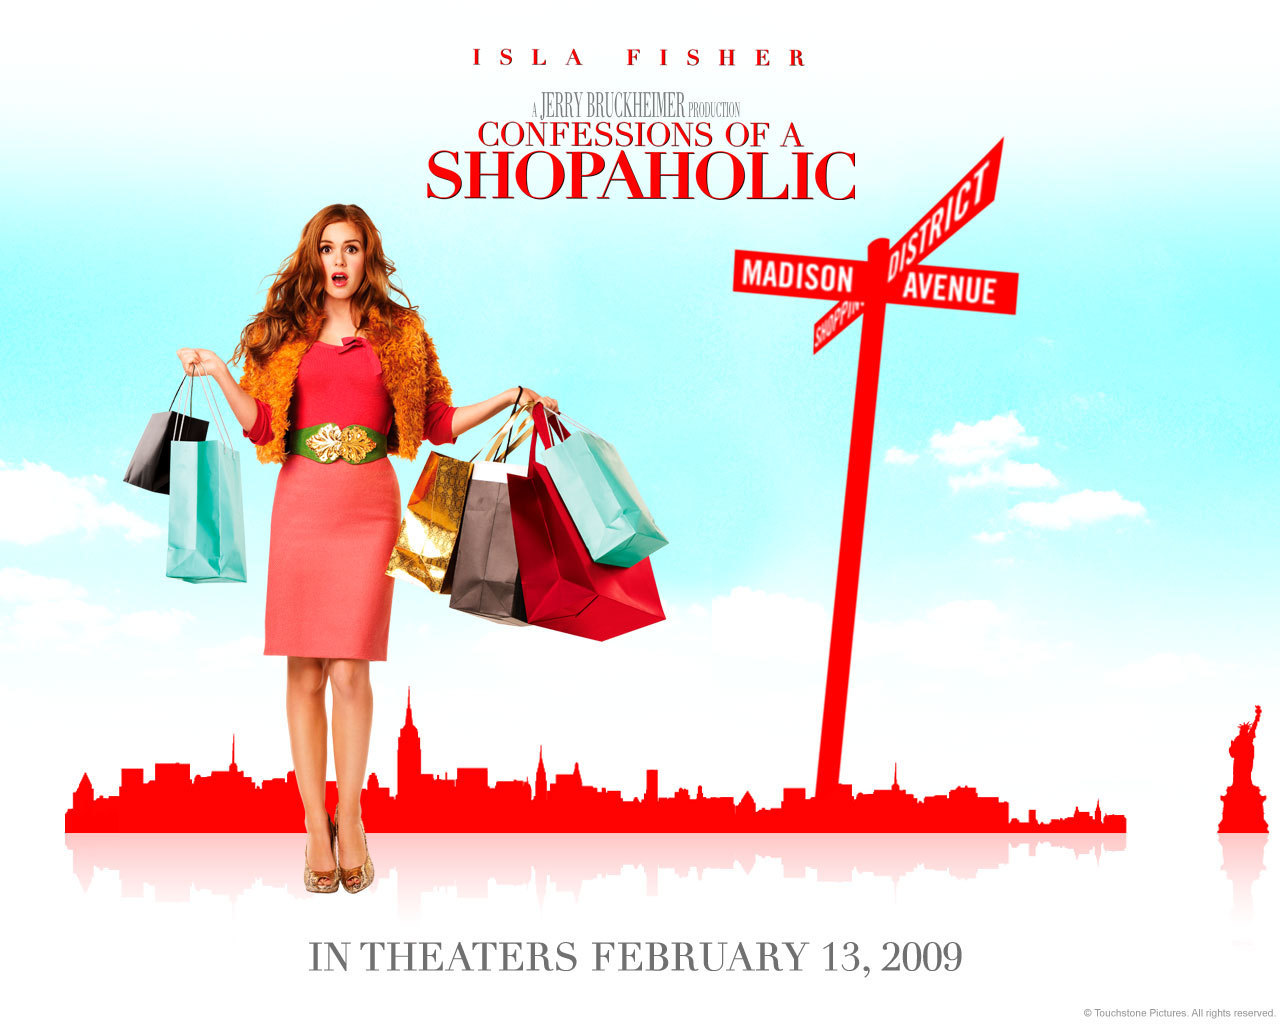 Shopaholic Wallpaper   Confessions of a Shopaholic Movie Wallpaper 1280x1024